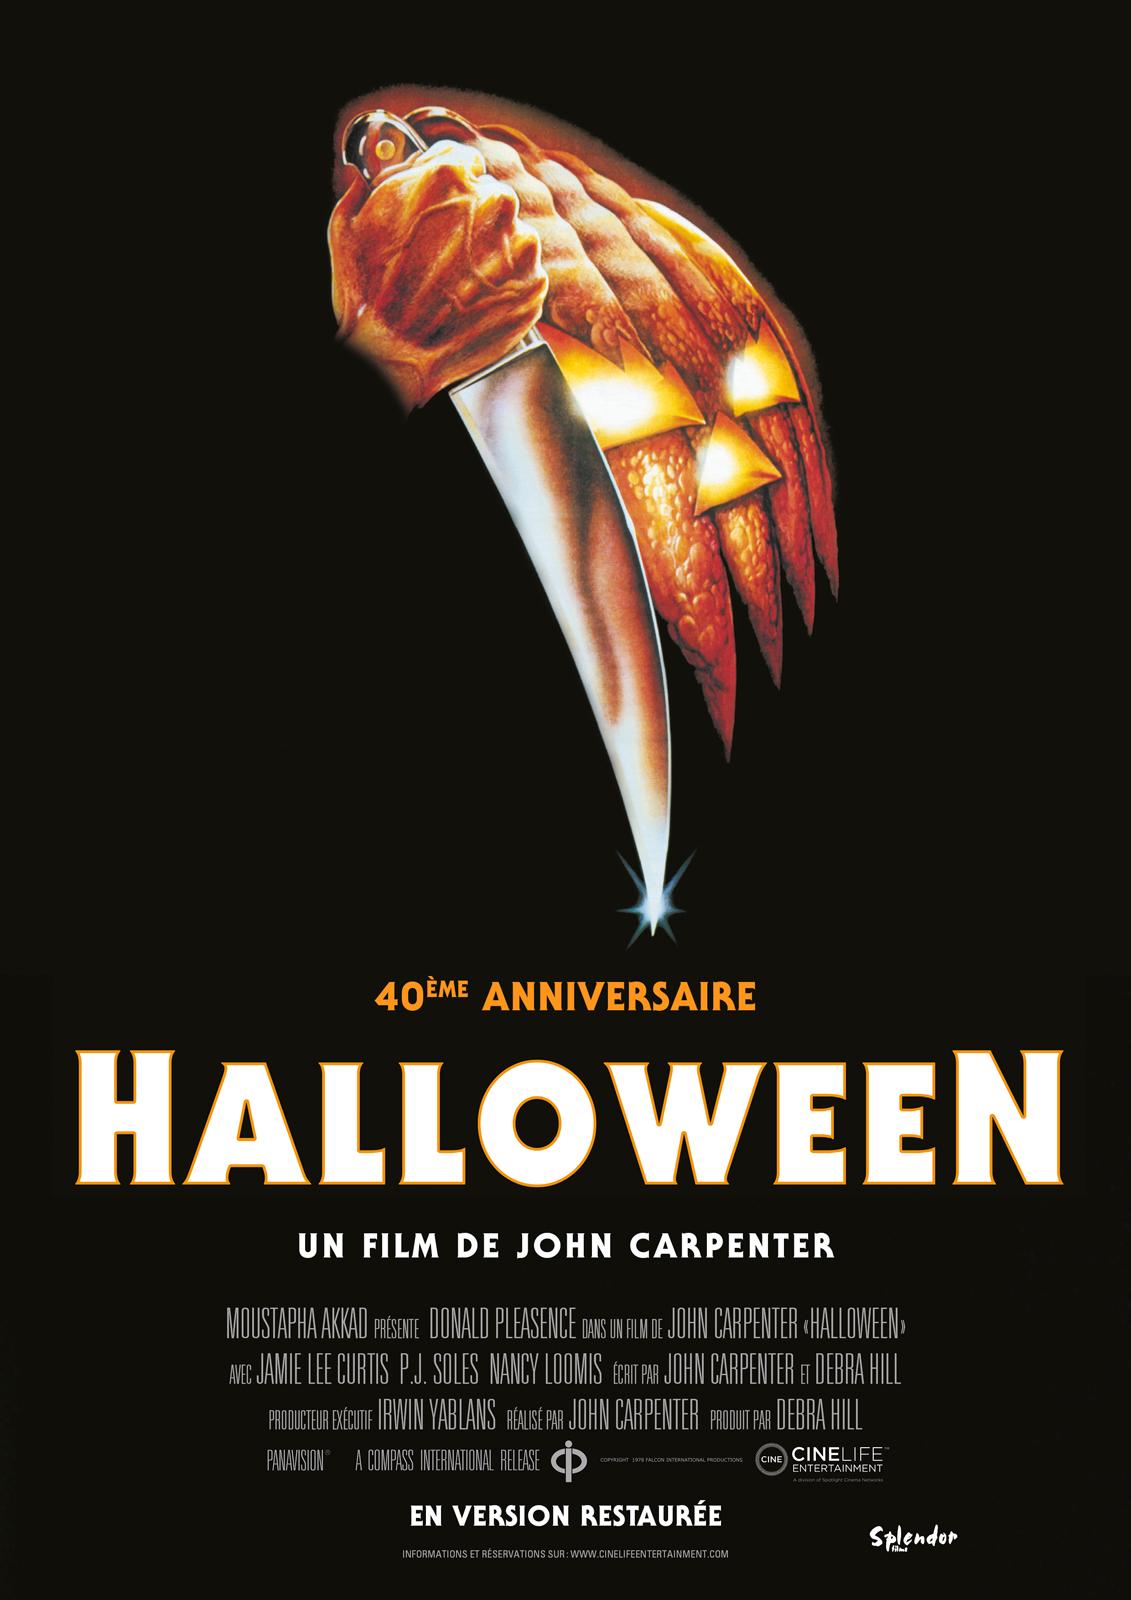 Halloween 9 Bande Annonce.Achat Halloween La Nuit Des Masques En Blu Ray Allocine